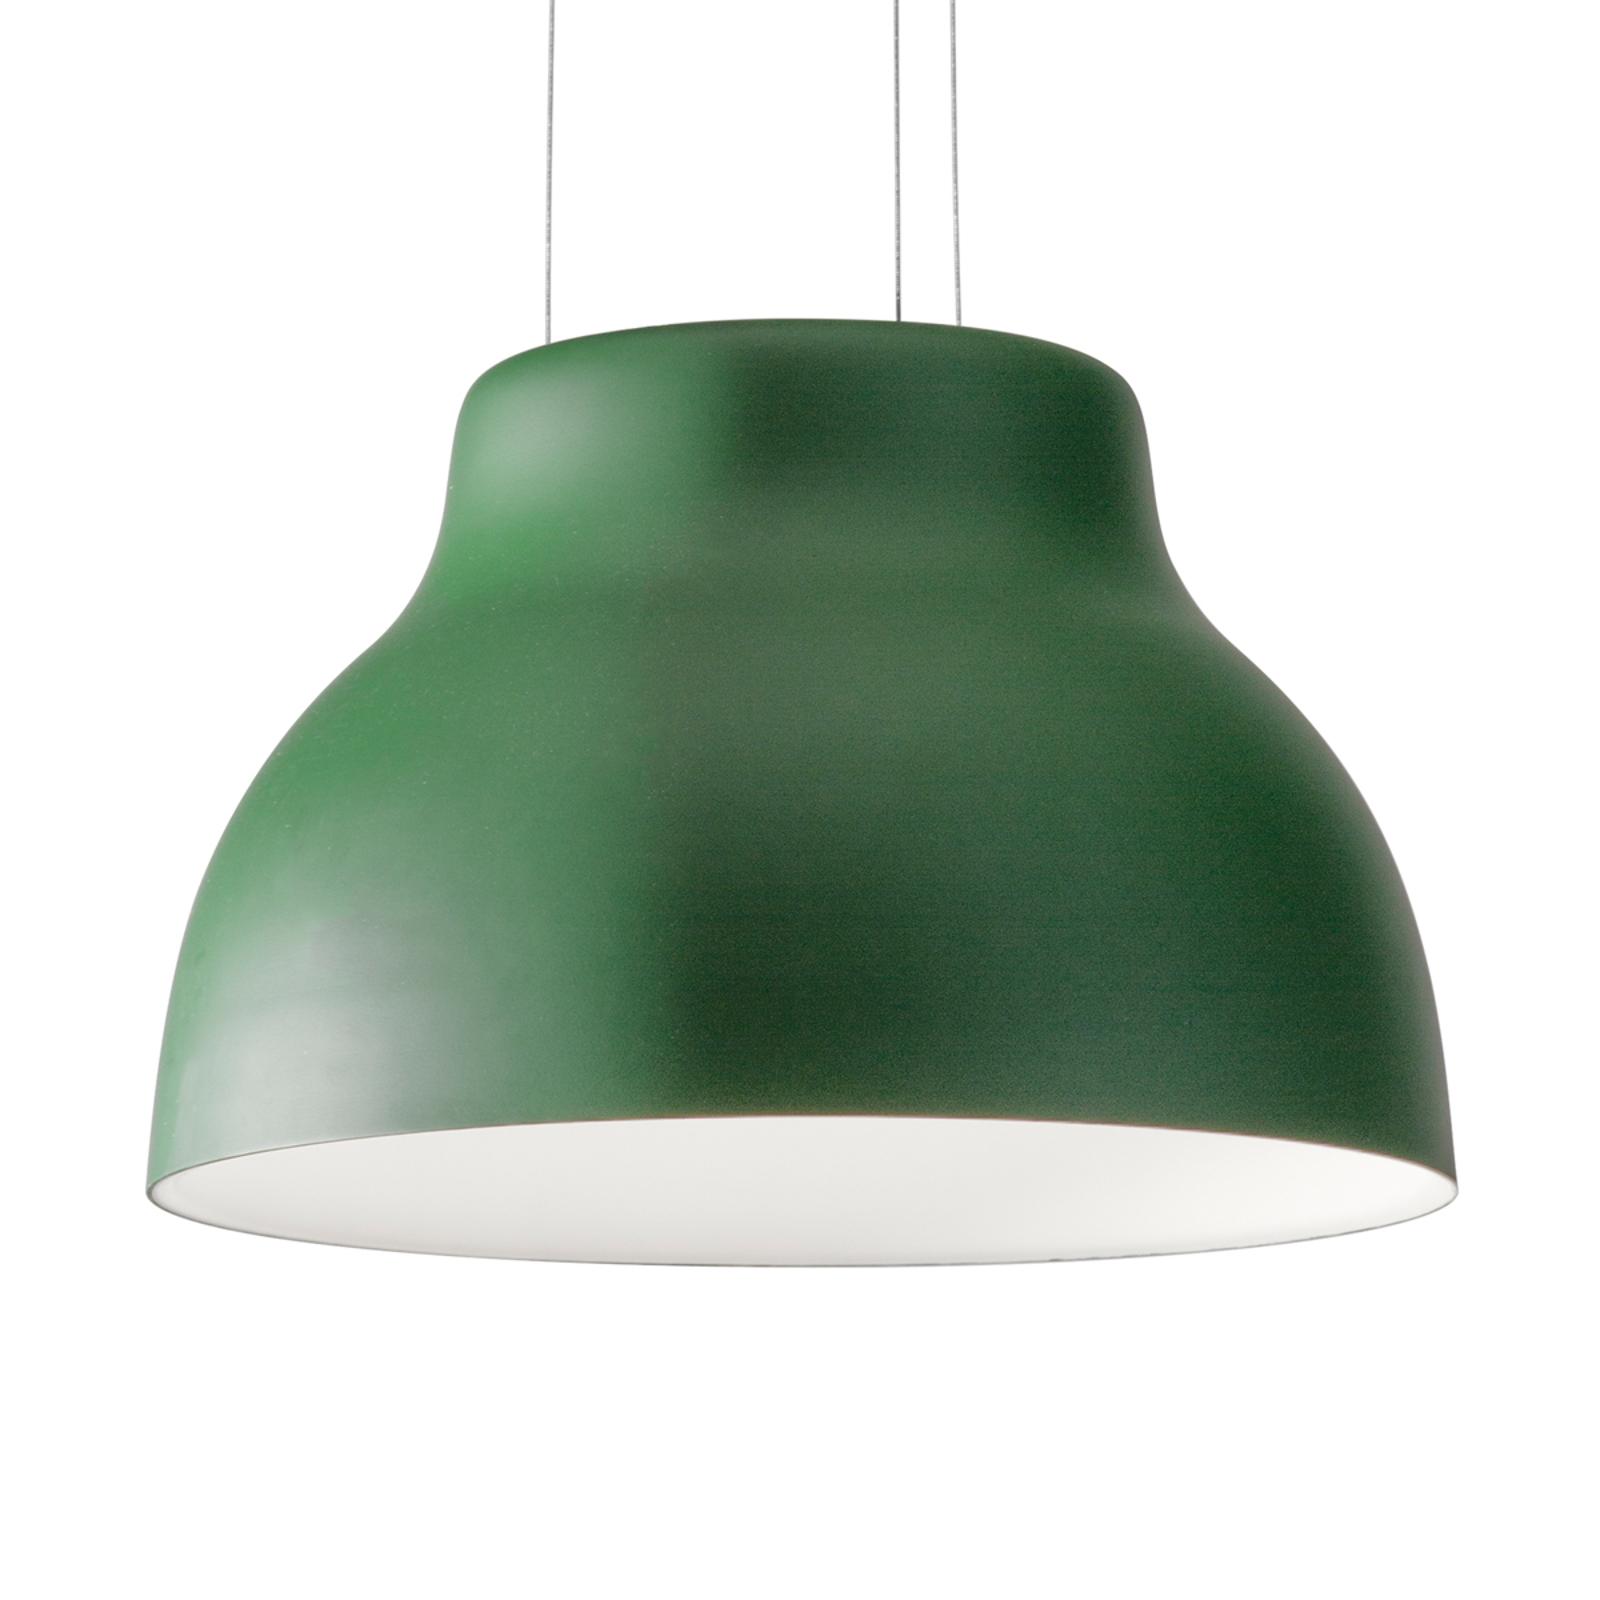 Martinelli Luce Cicala - LED-Pendelleuchte, grün